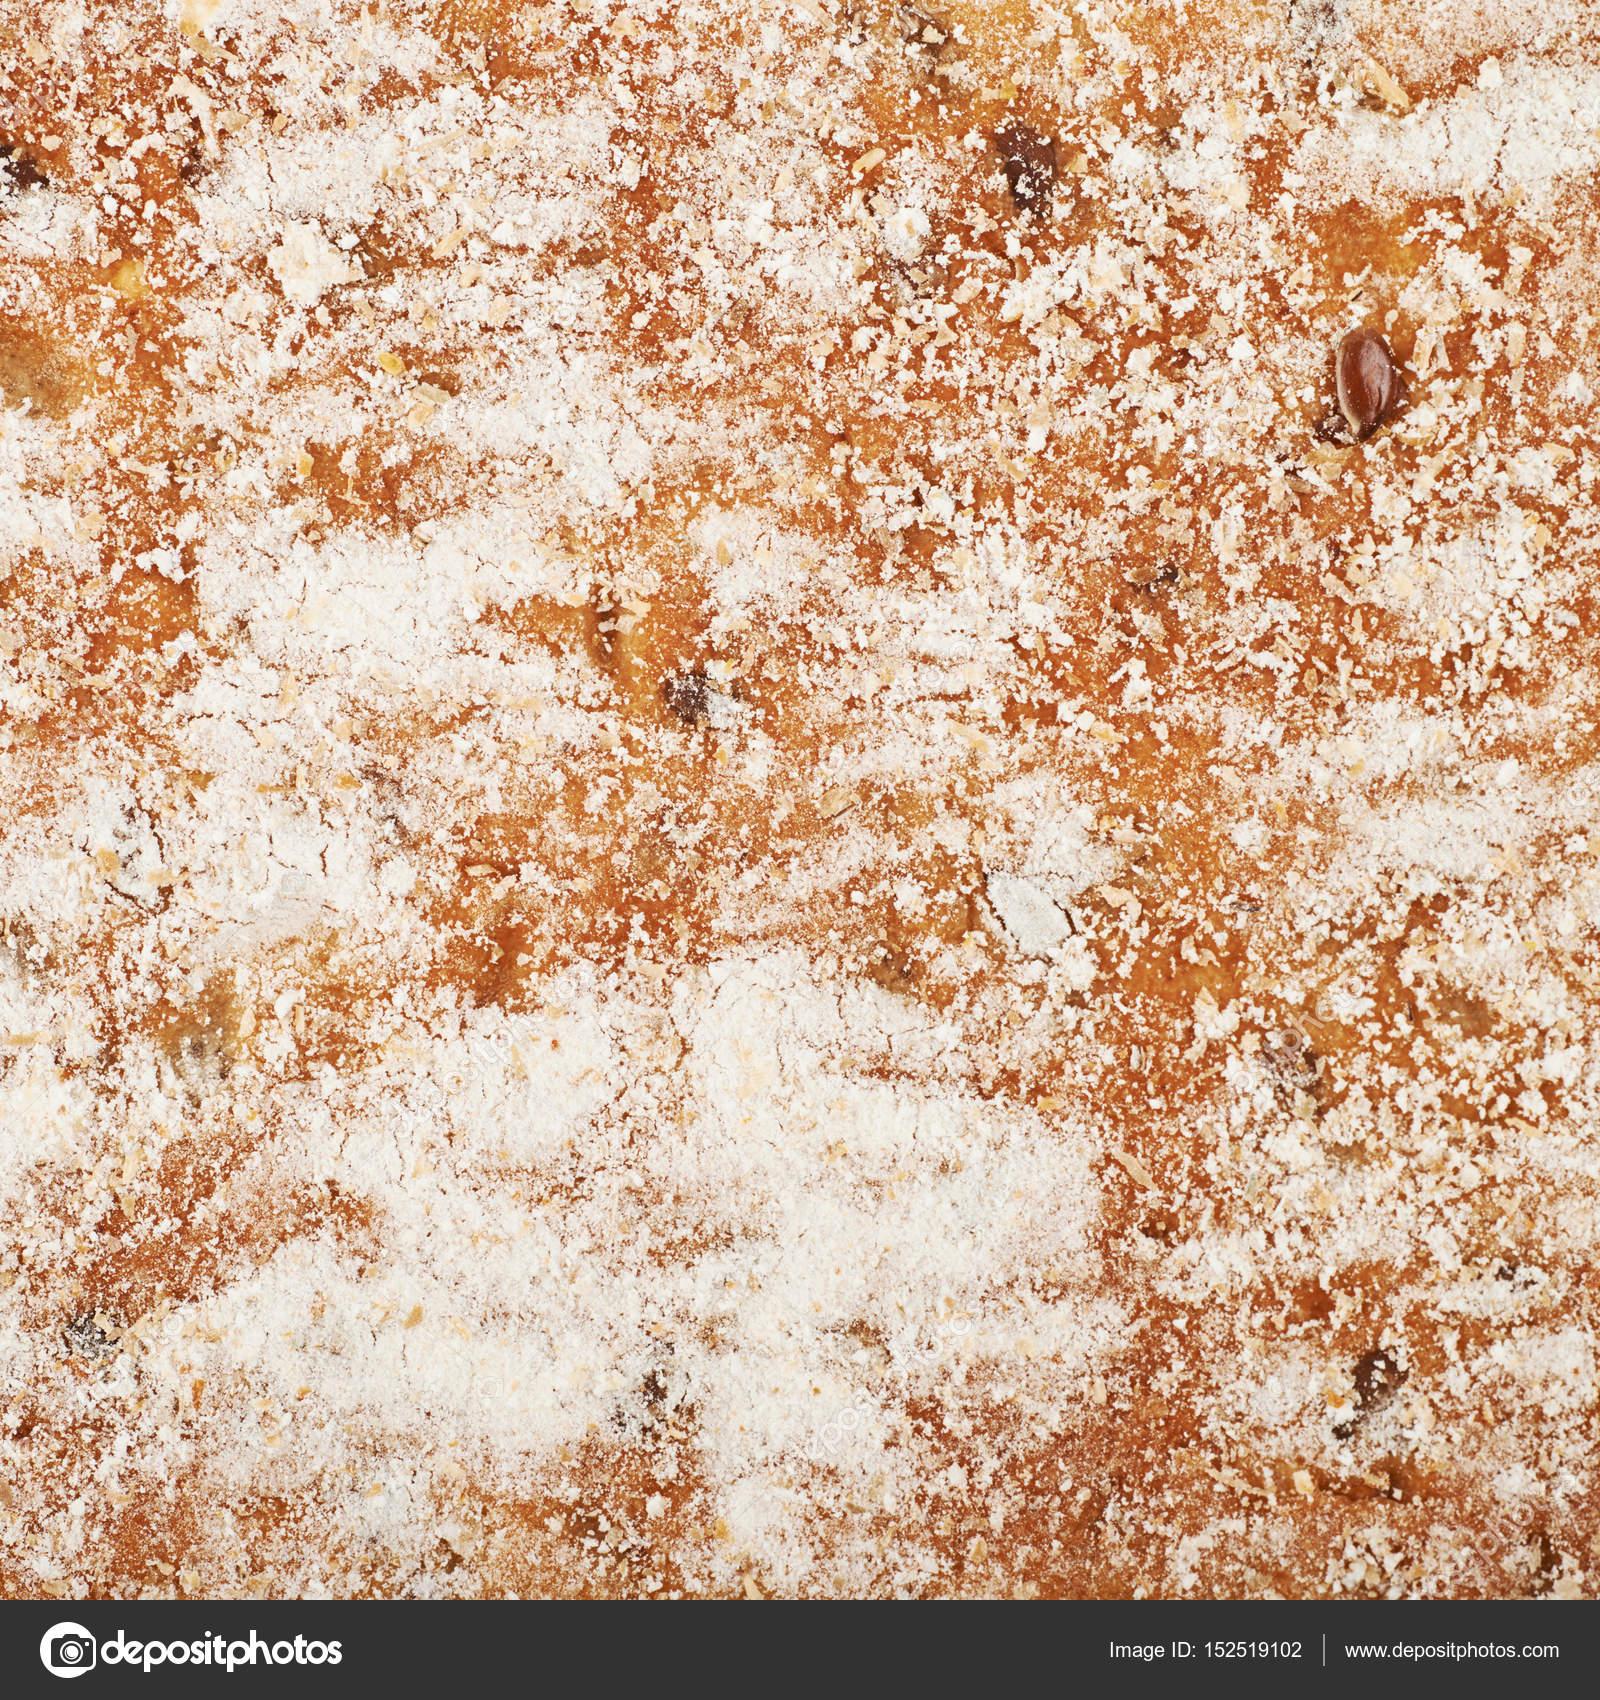 Bread crust texture